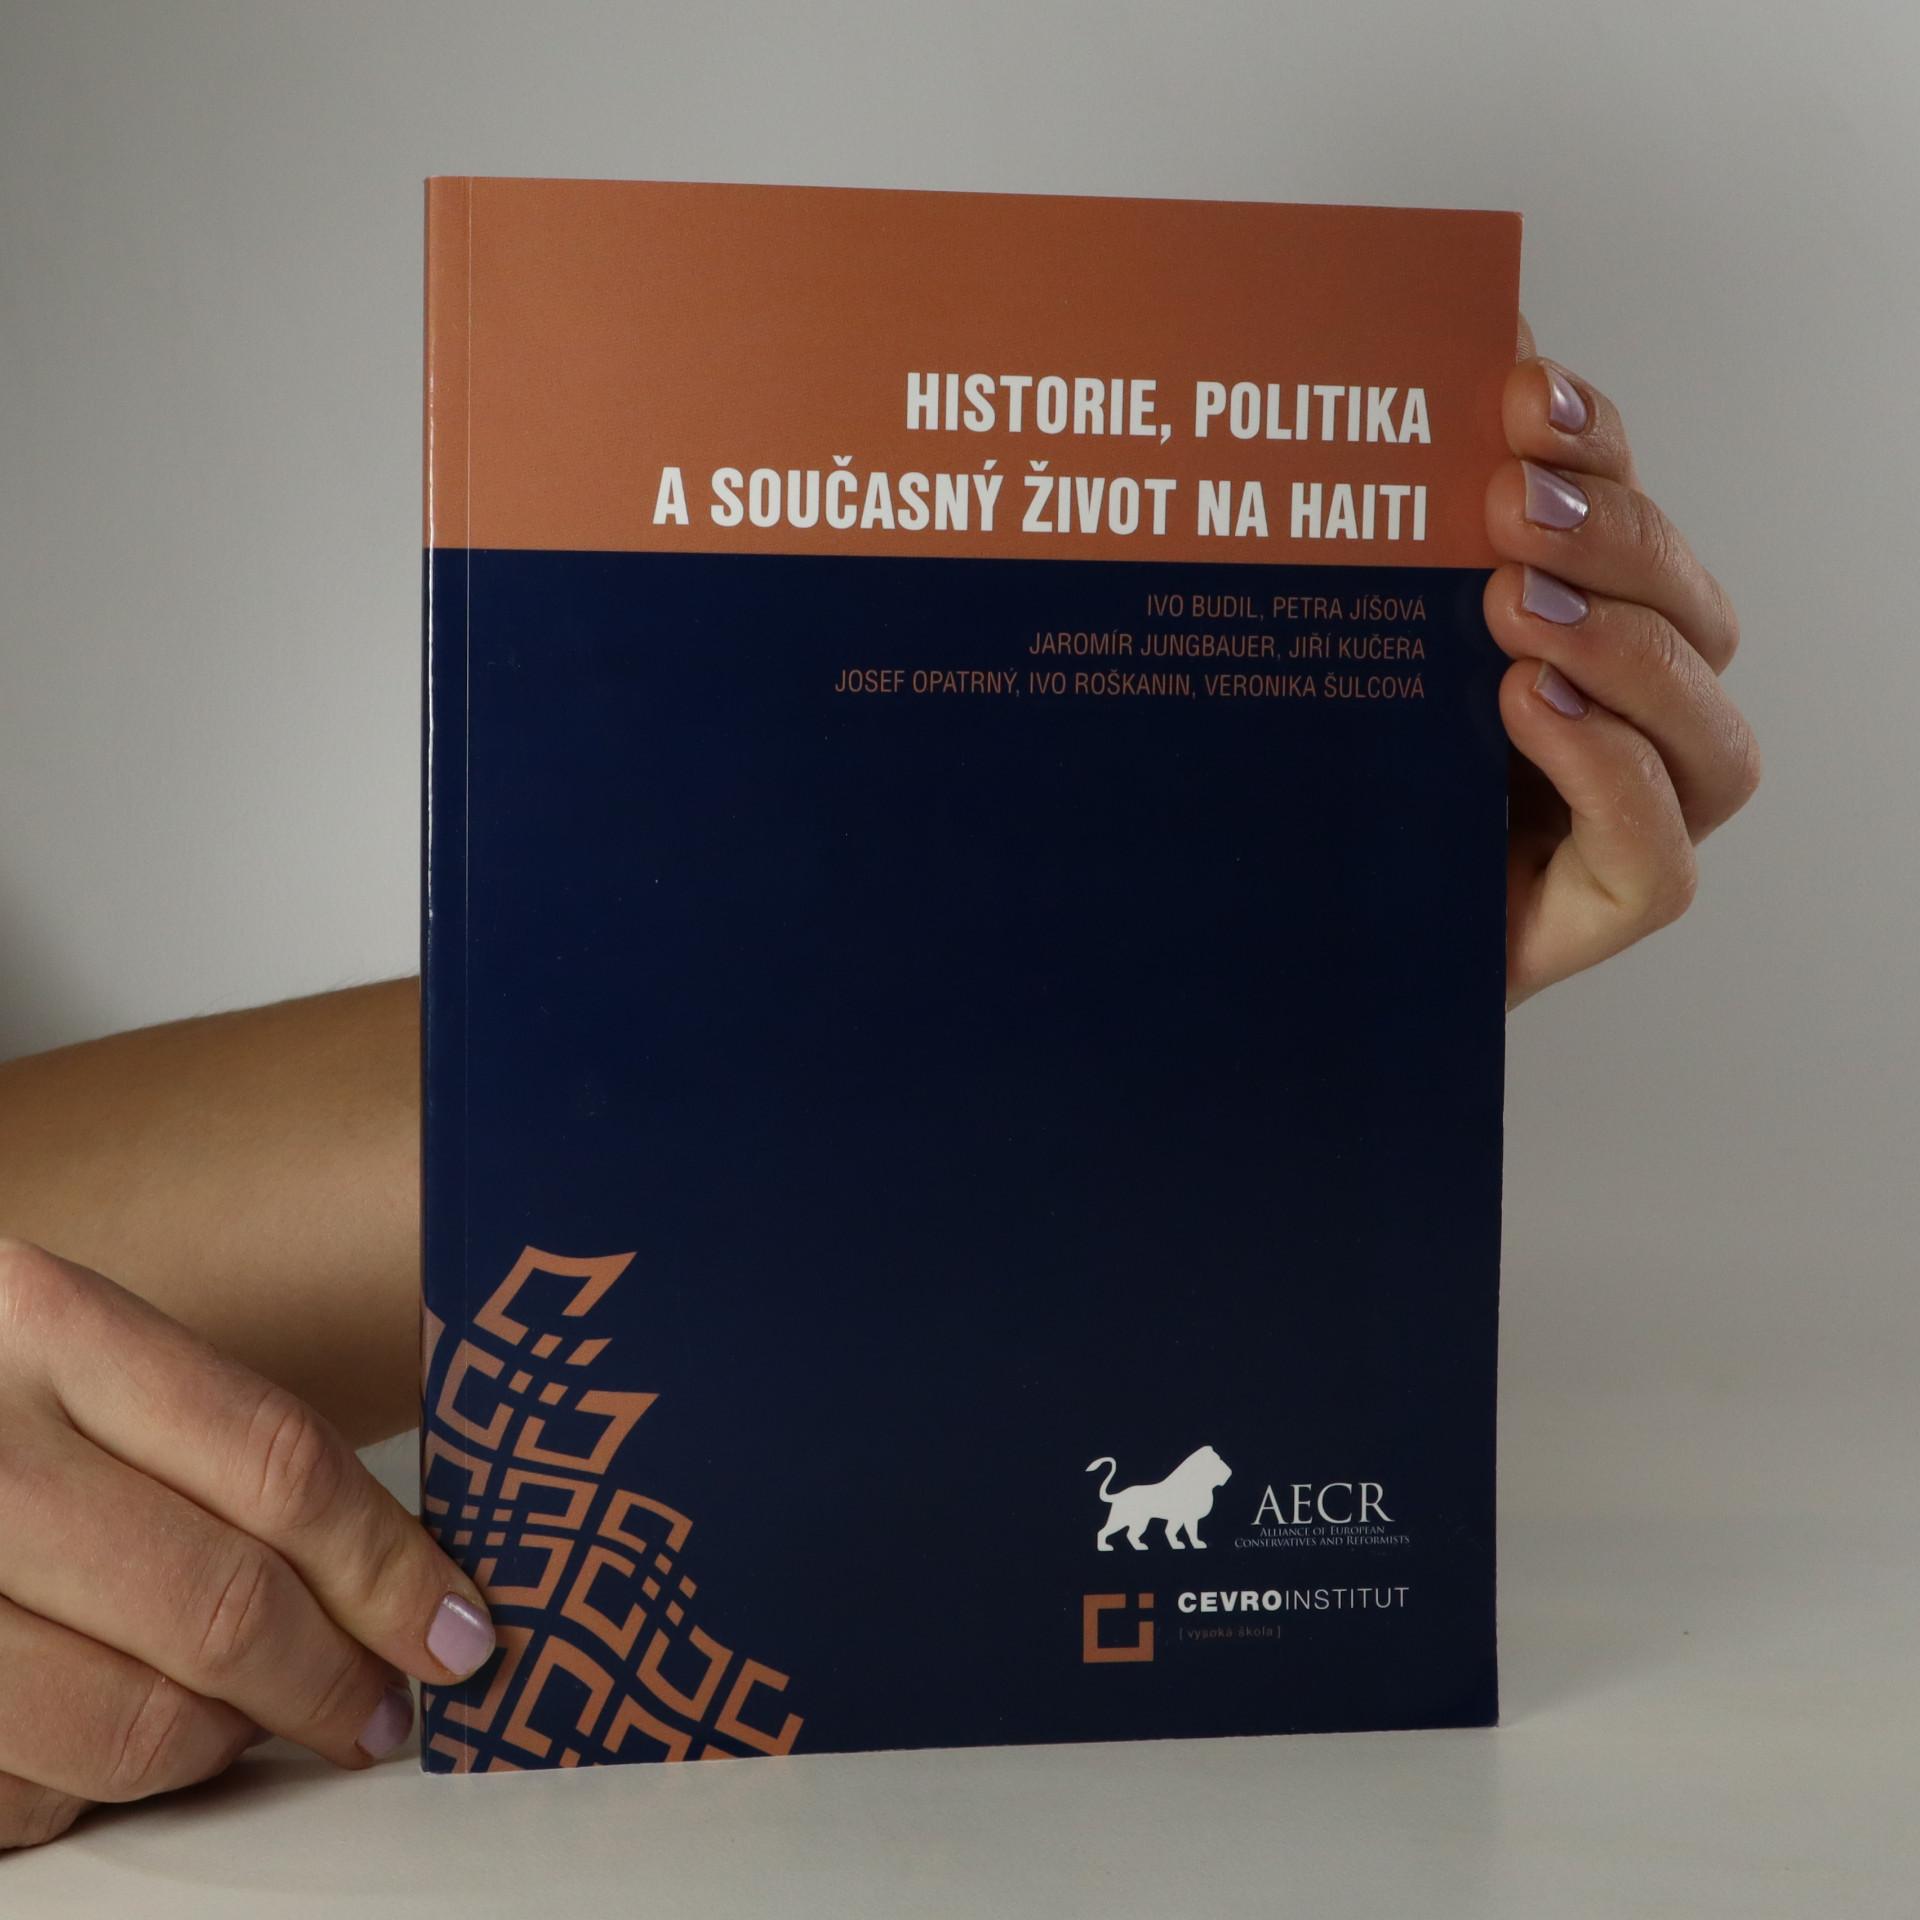 antikvární kniha Historie, politika a současný život na Haiti, 2012